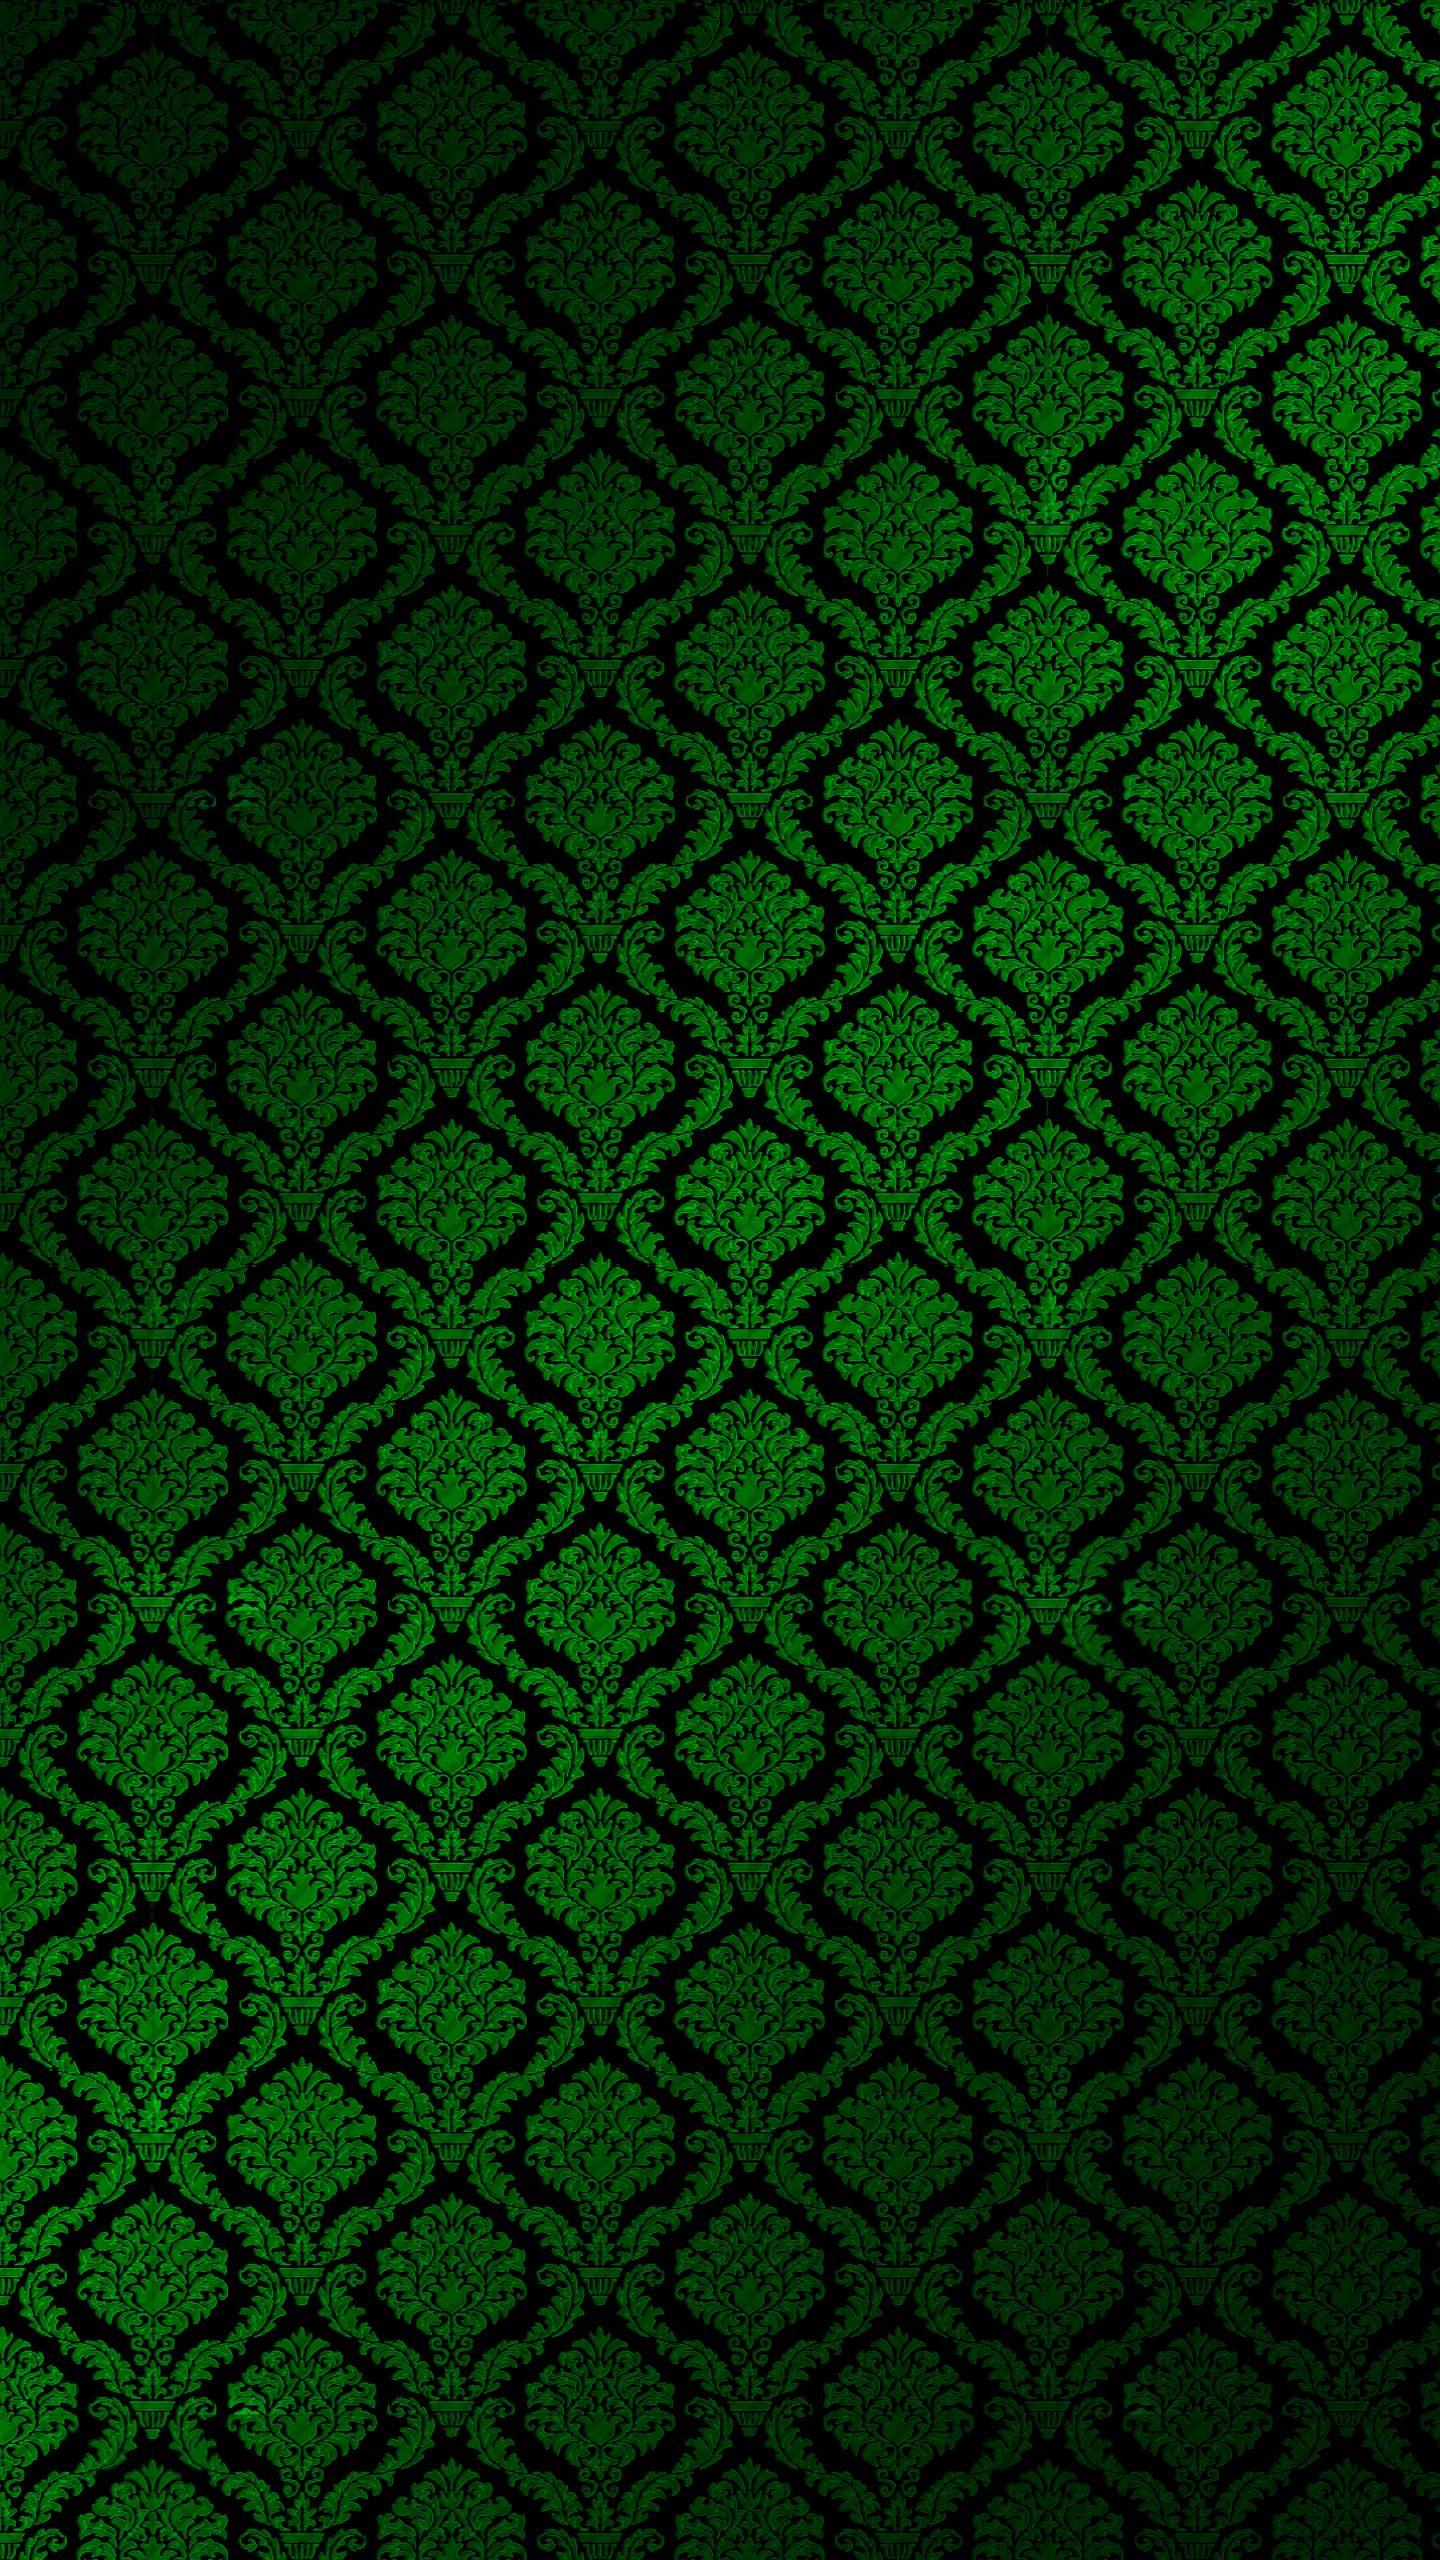 Cool green black wallpaper smartphone smart phone wqhd wallpaper voltagebd Image collections